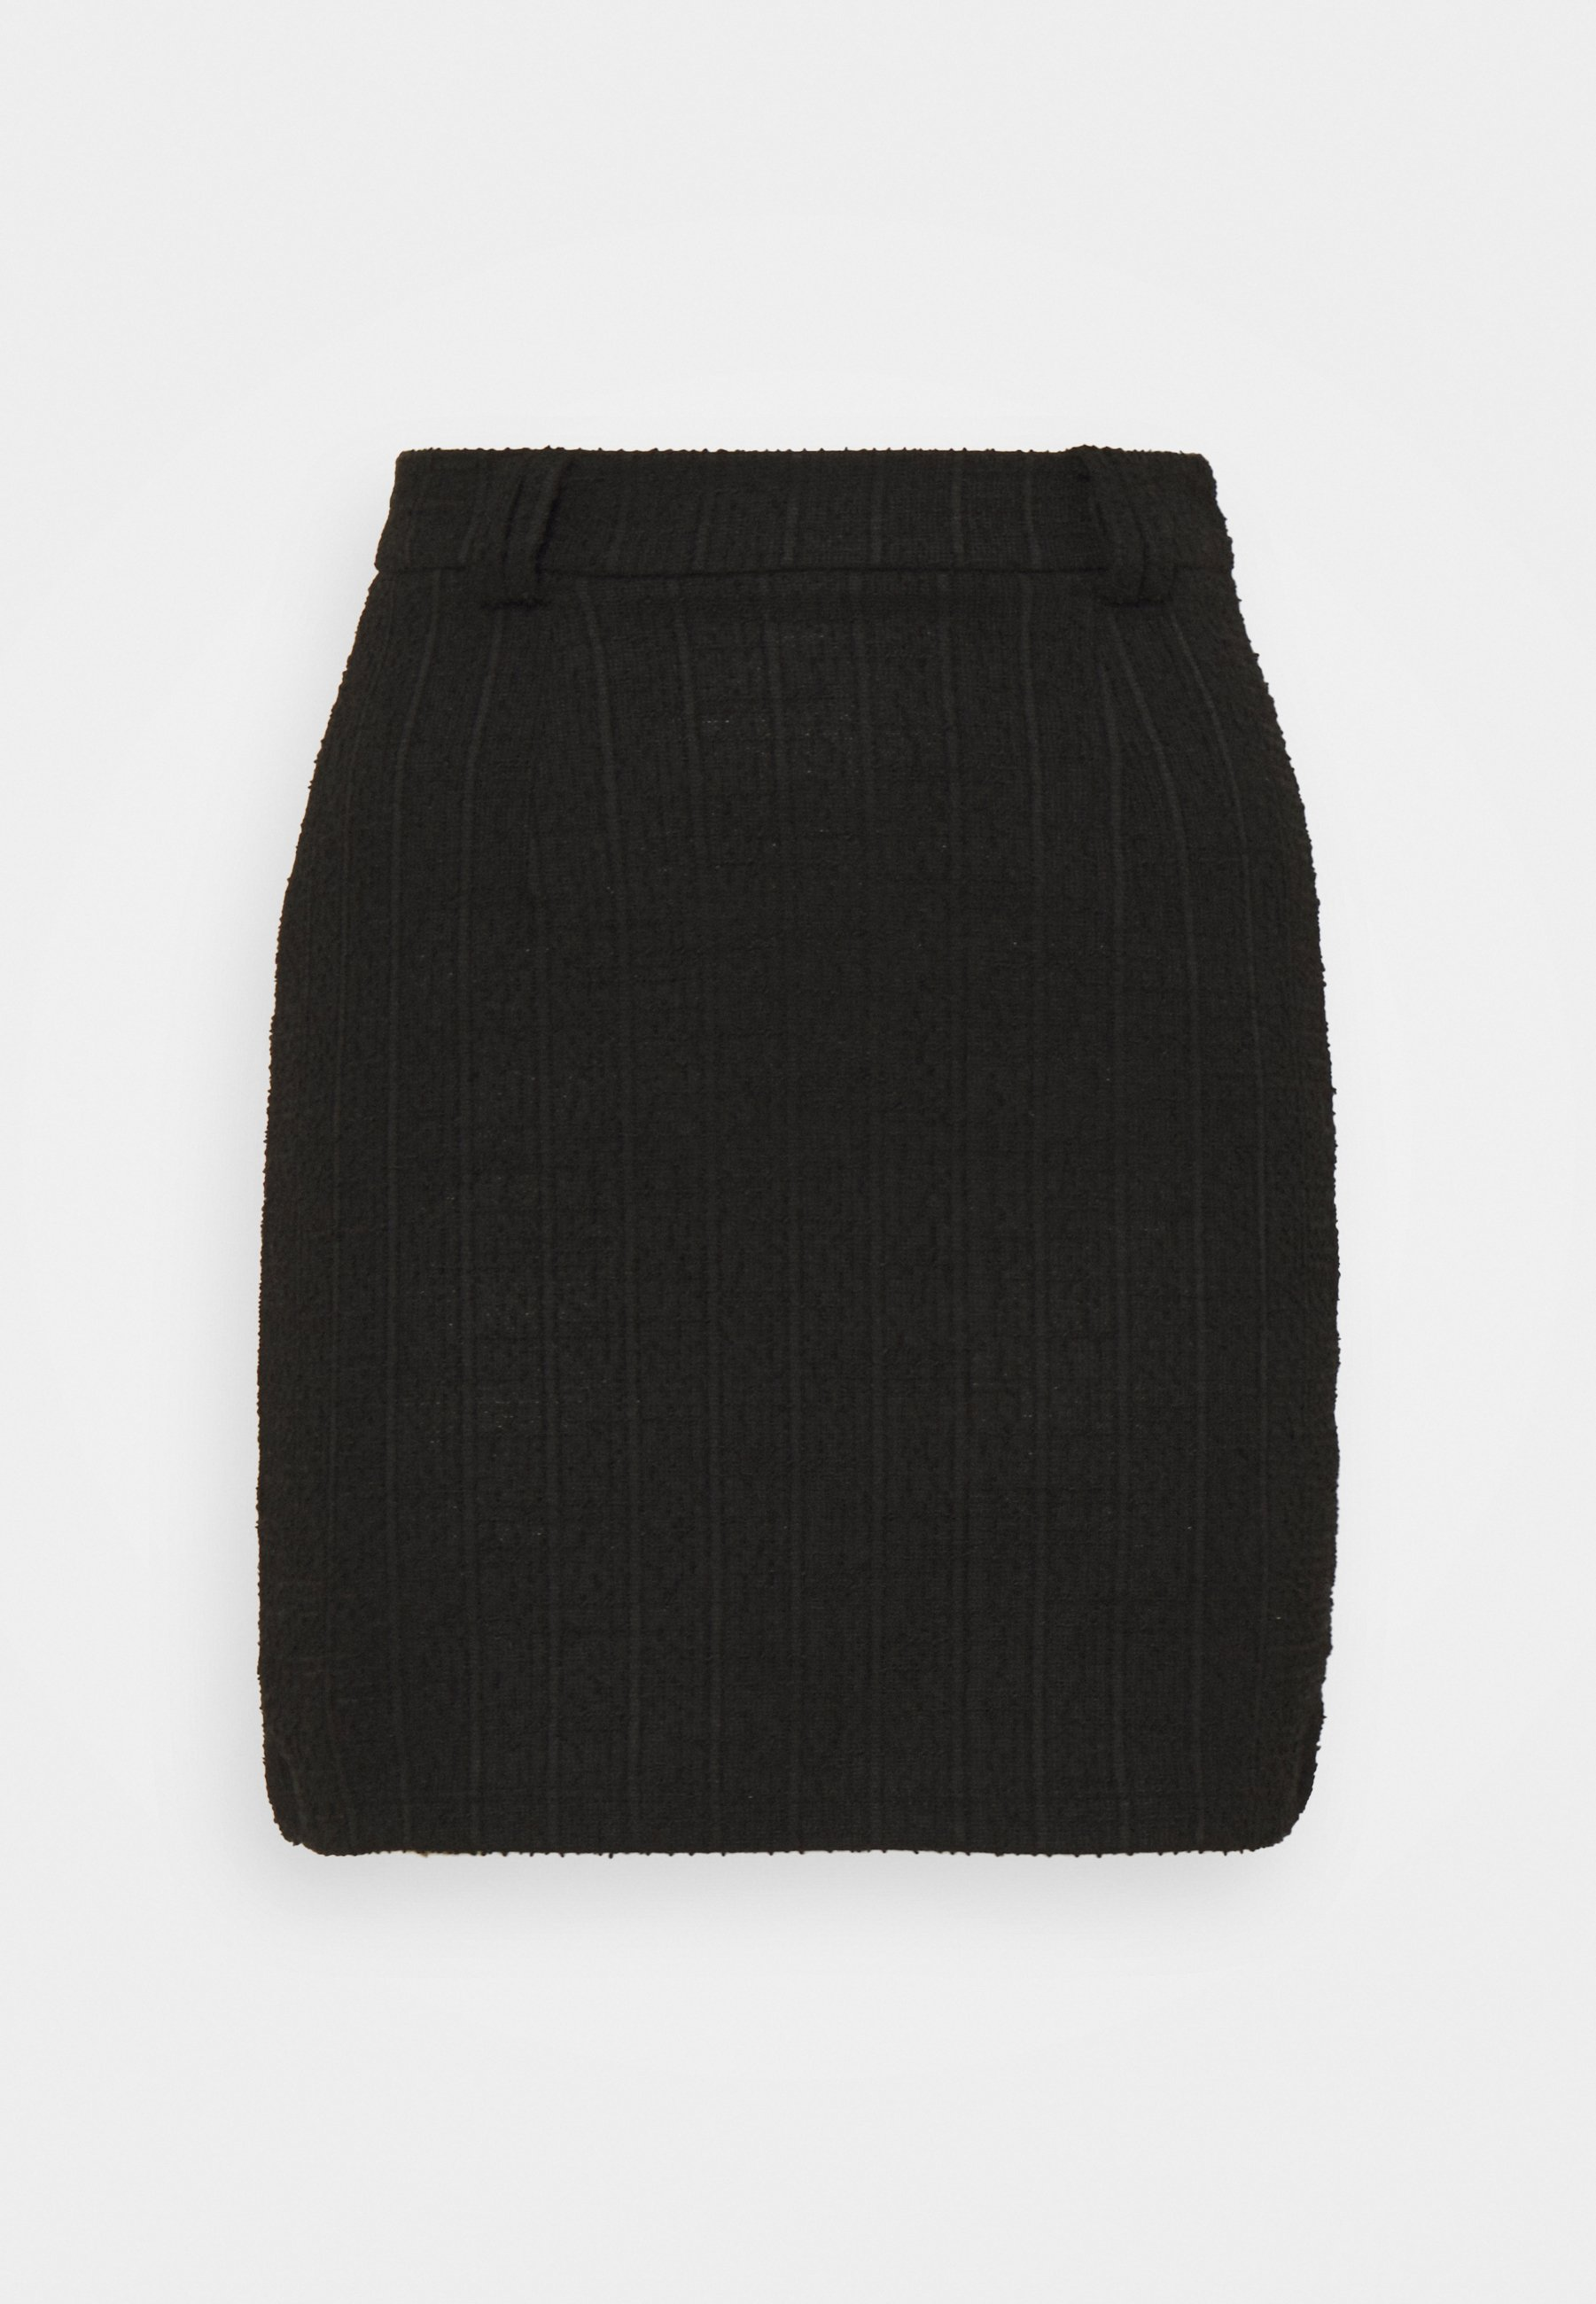 Femme mini skirt with belt loop - Jupe crayon